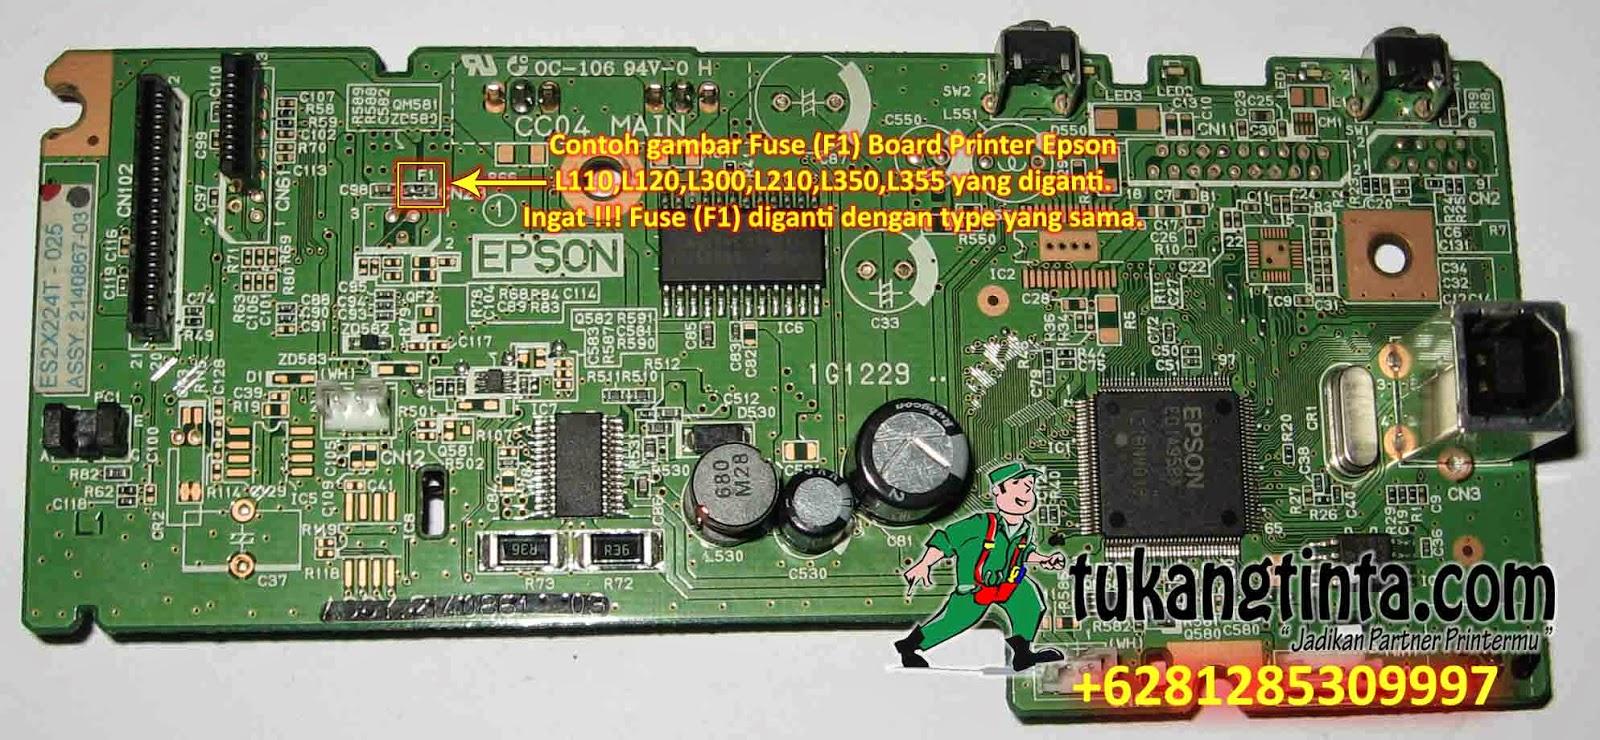 Pusat Modifikasi Printer Infus Cara Service Printer Epson L110 L120